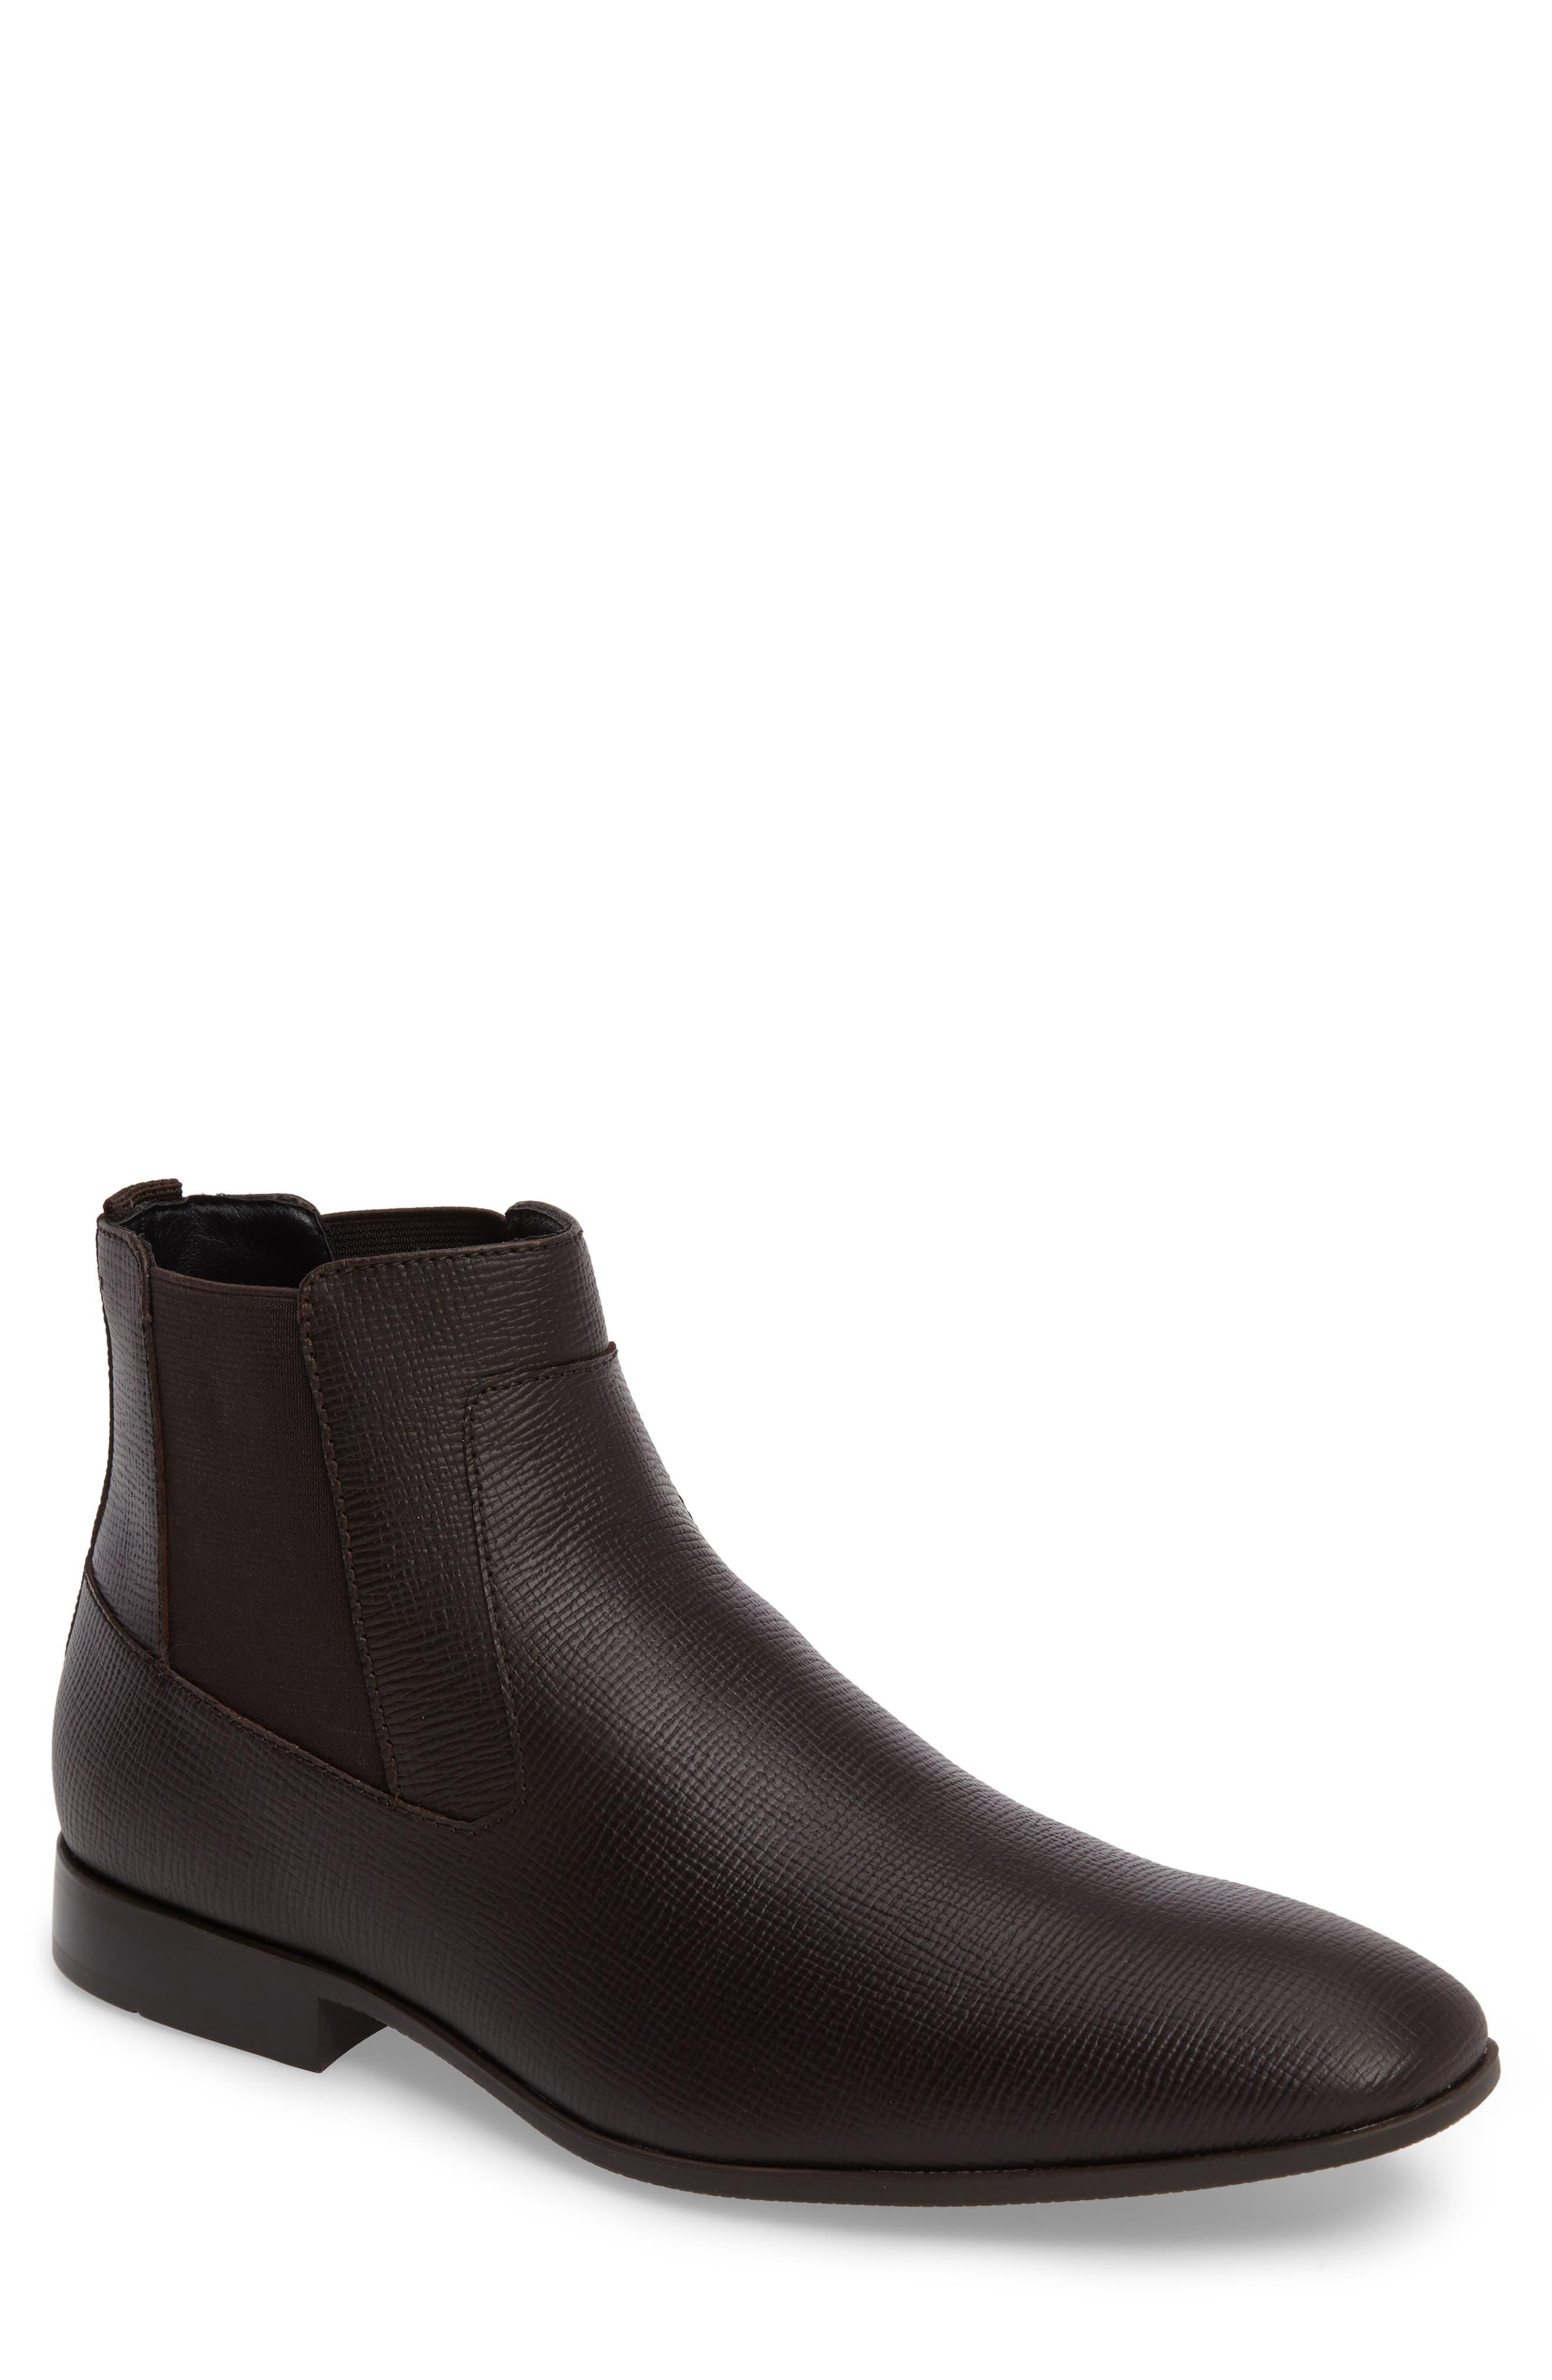 Christoff Chelsea Boot,                         Main,                         color, Dark Brown Epi Leather